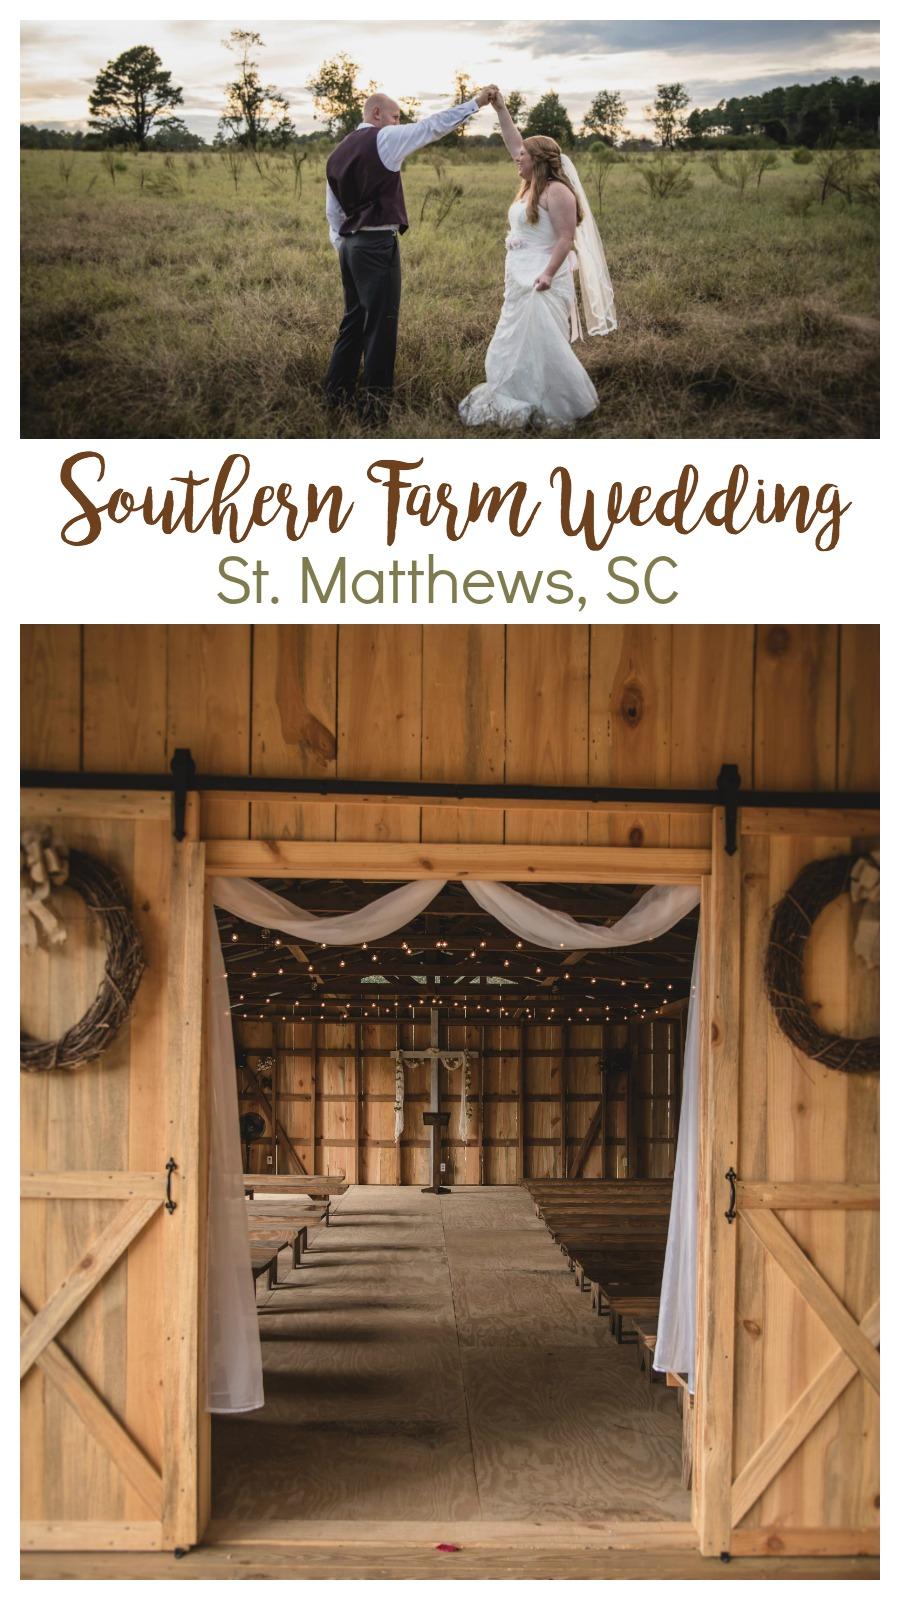 Savannah and Stephen: Sentimental Wedding in St. Matthews, South Carolina | Palmetto State Weddings | Northern Red Photography | farm wedding South Carolina | Southern farm wedding | red barn wedding